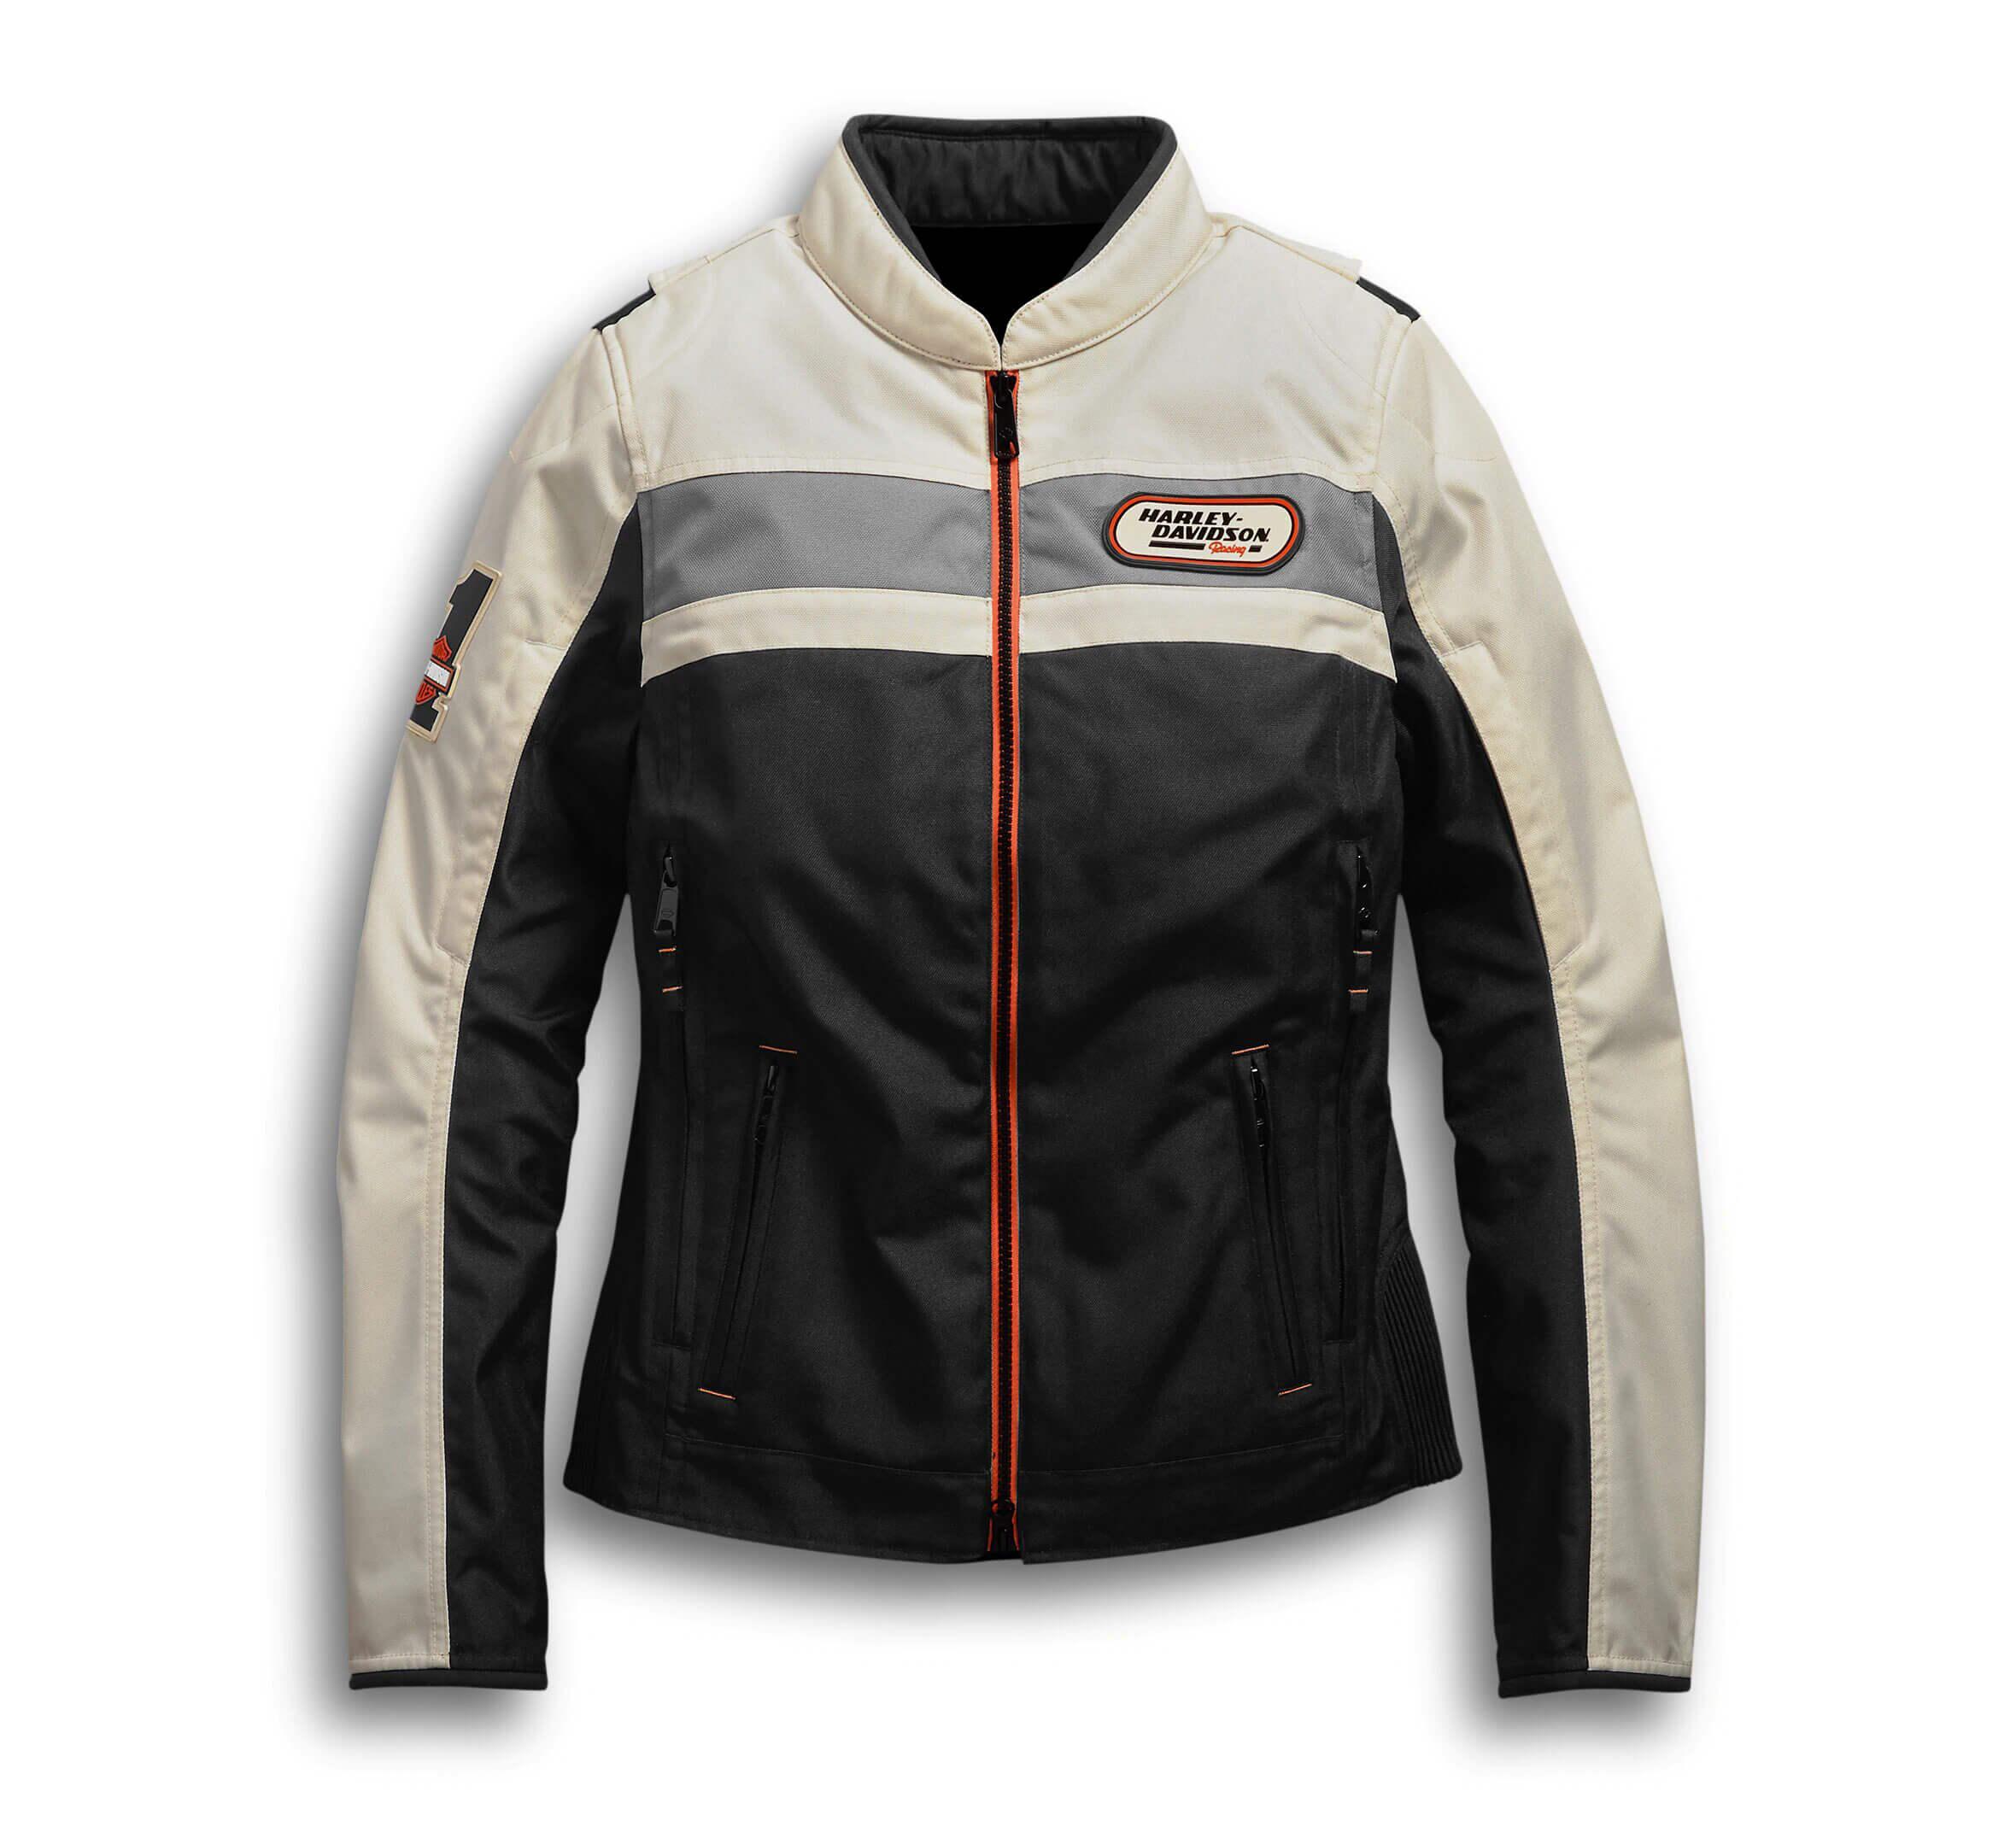 Black Cream Harley Davidson Motorcycle Leather Jacket